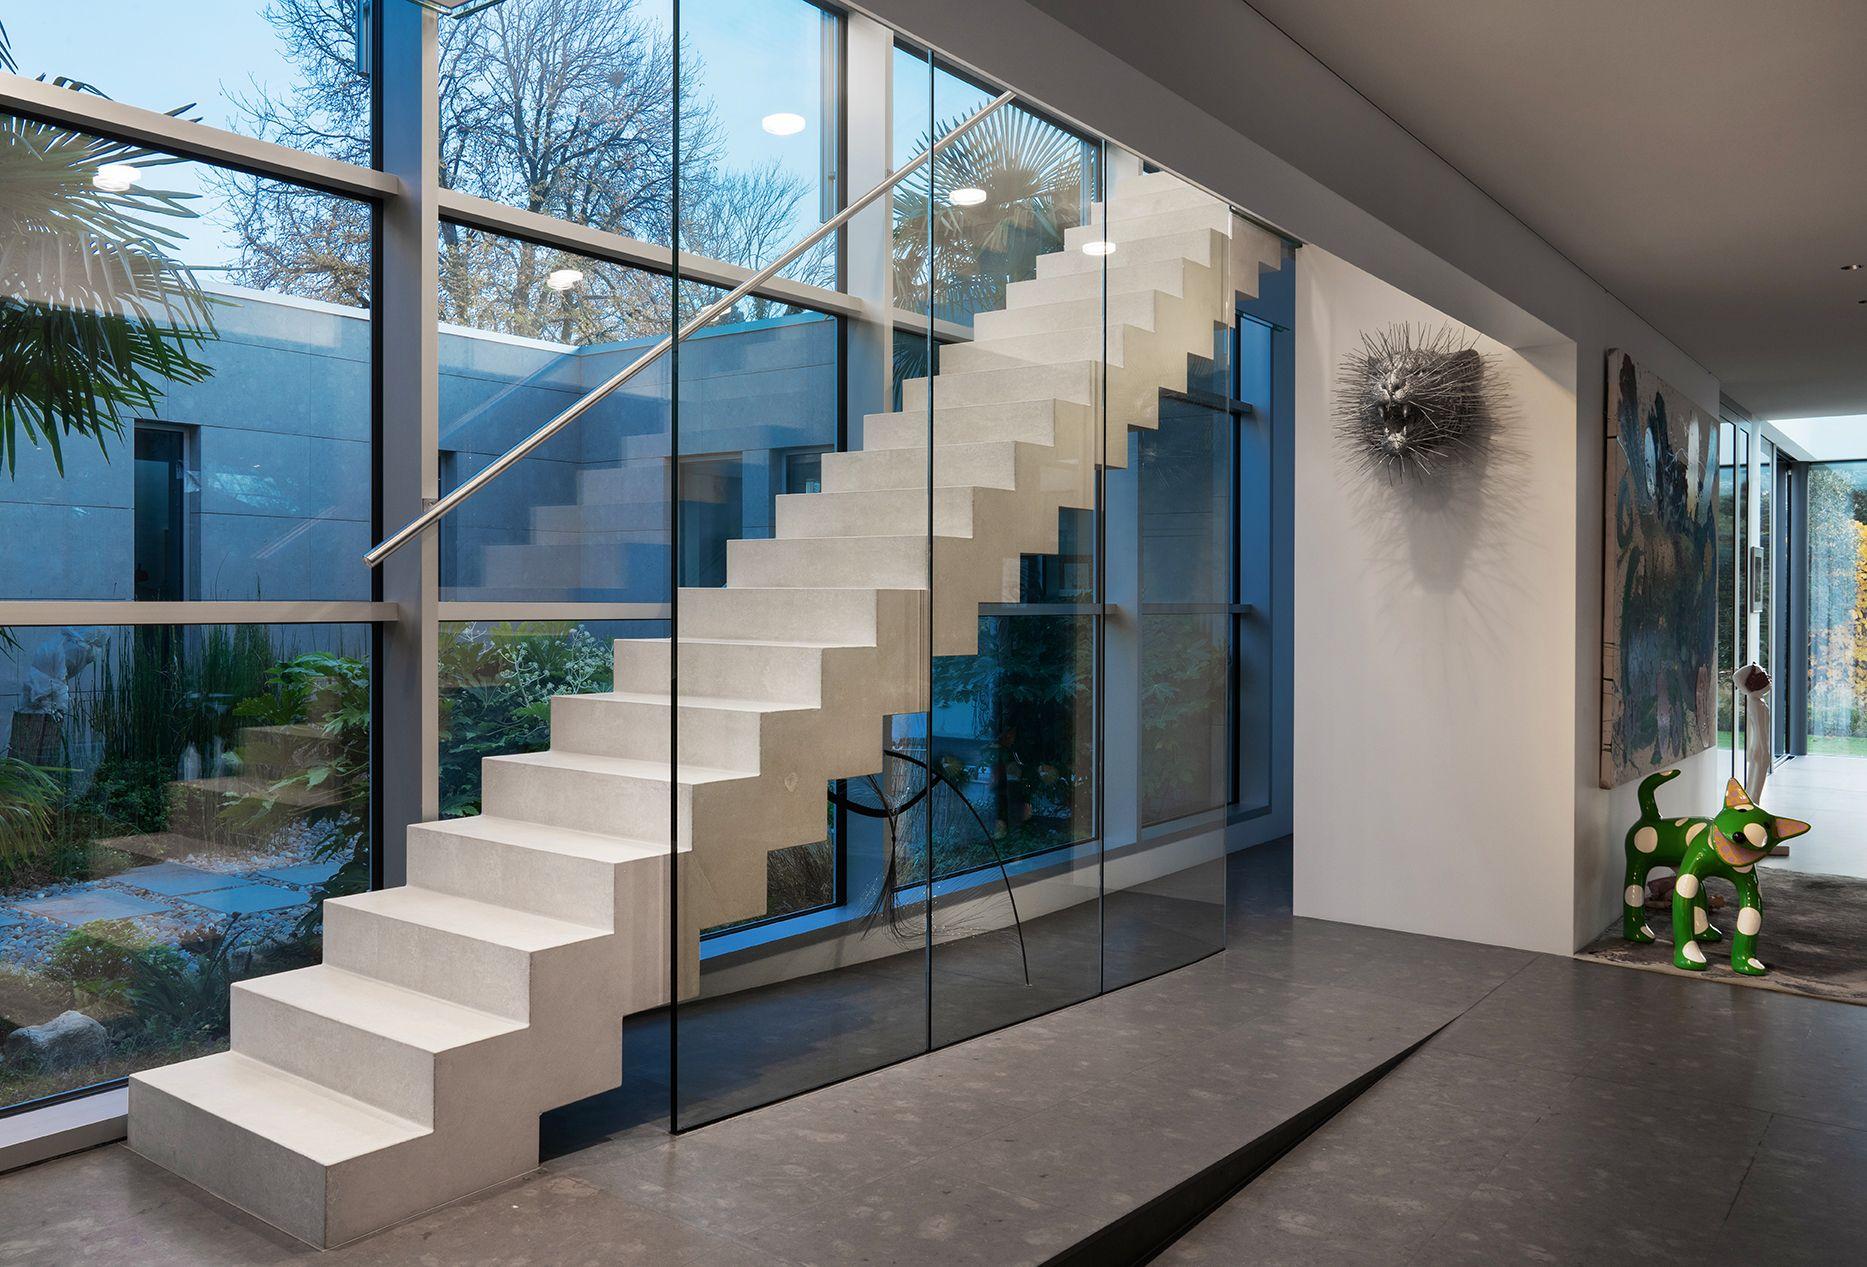 Villa in Svizzera - image 39